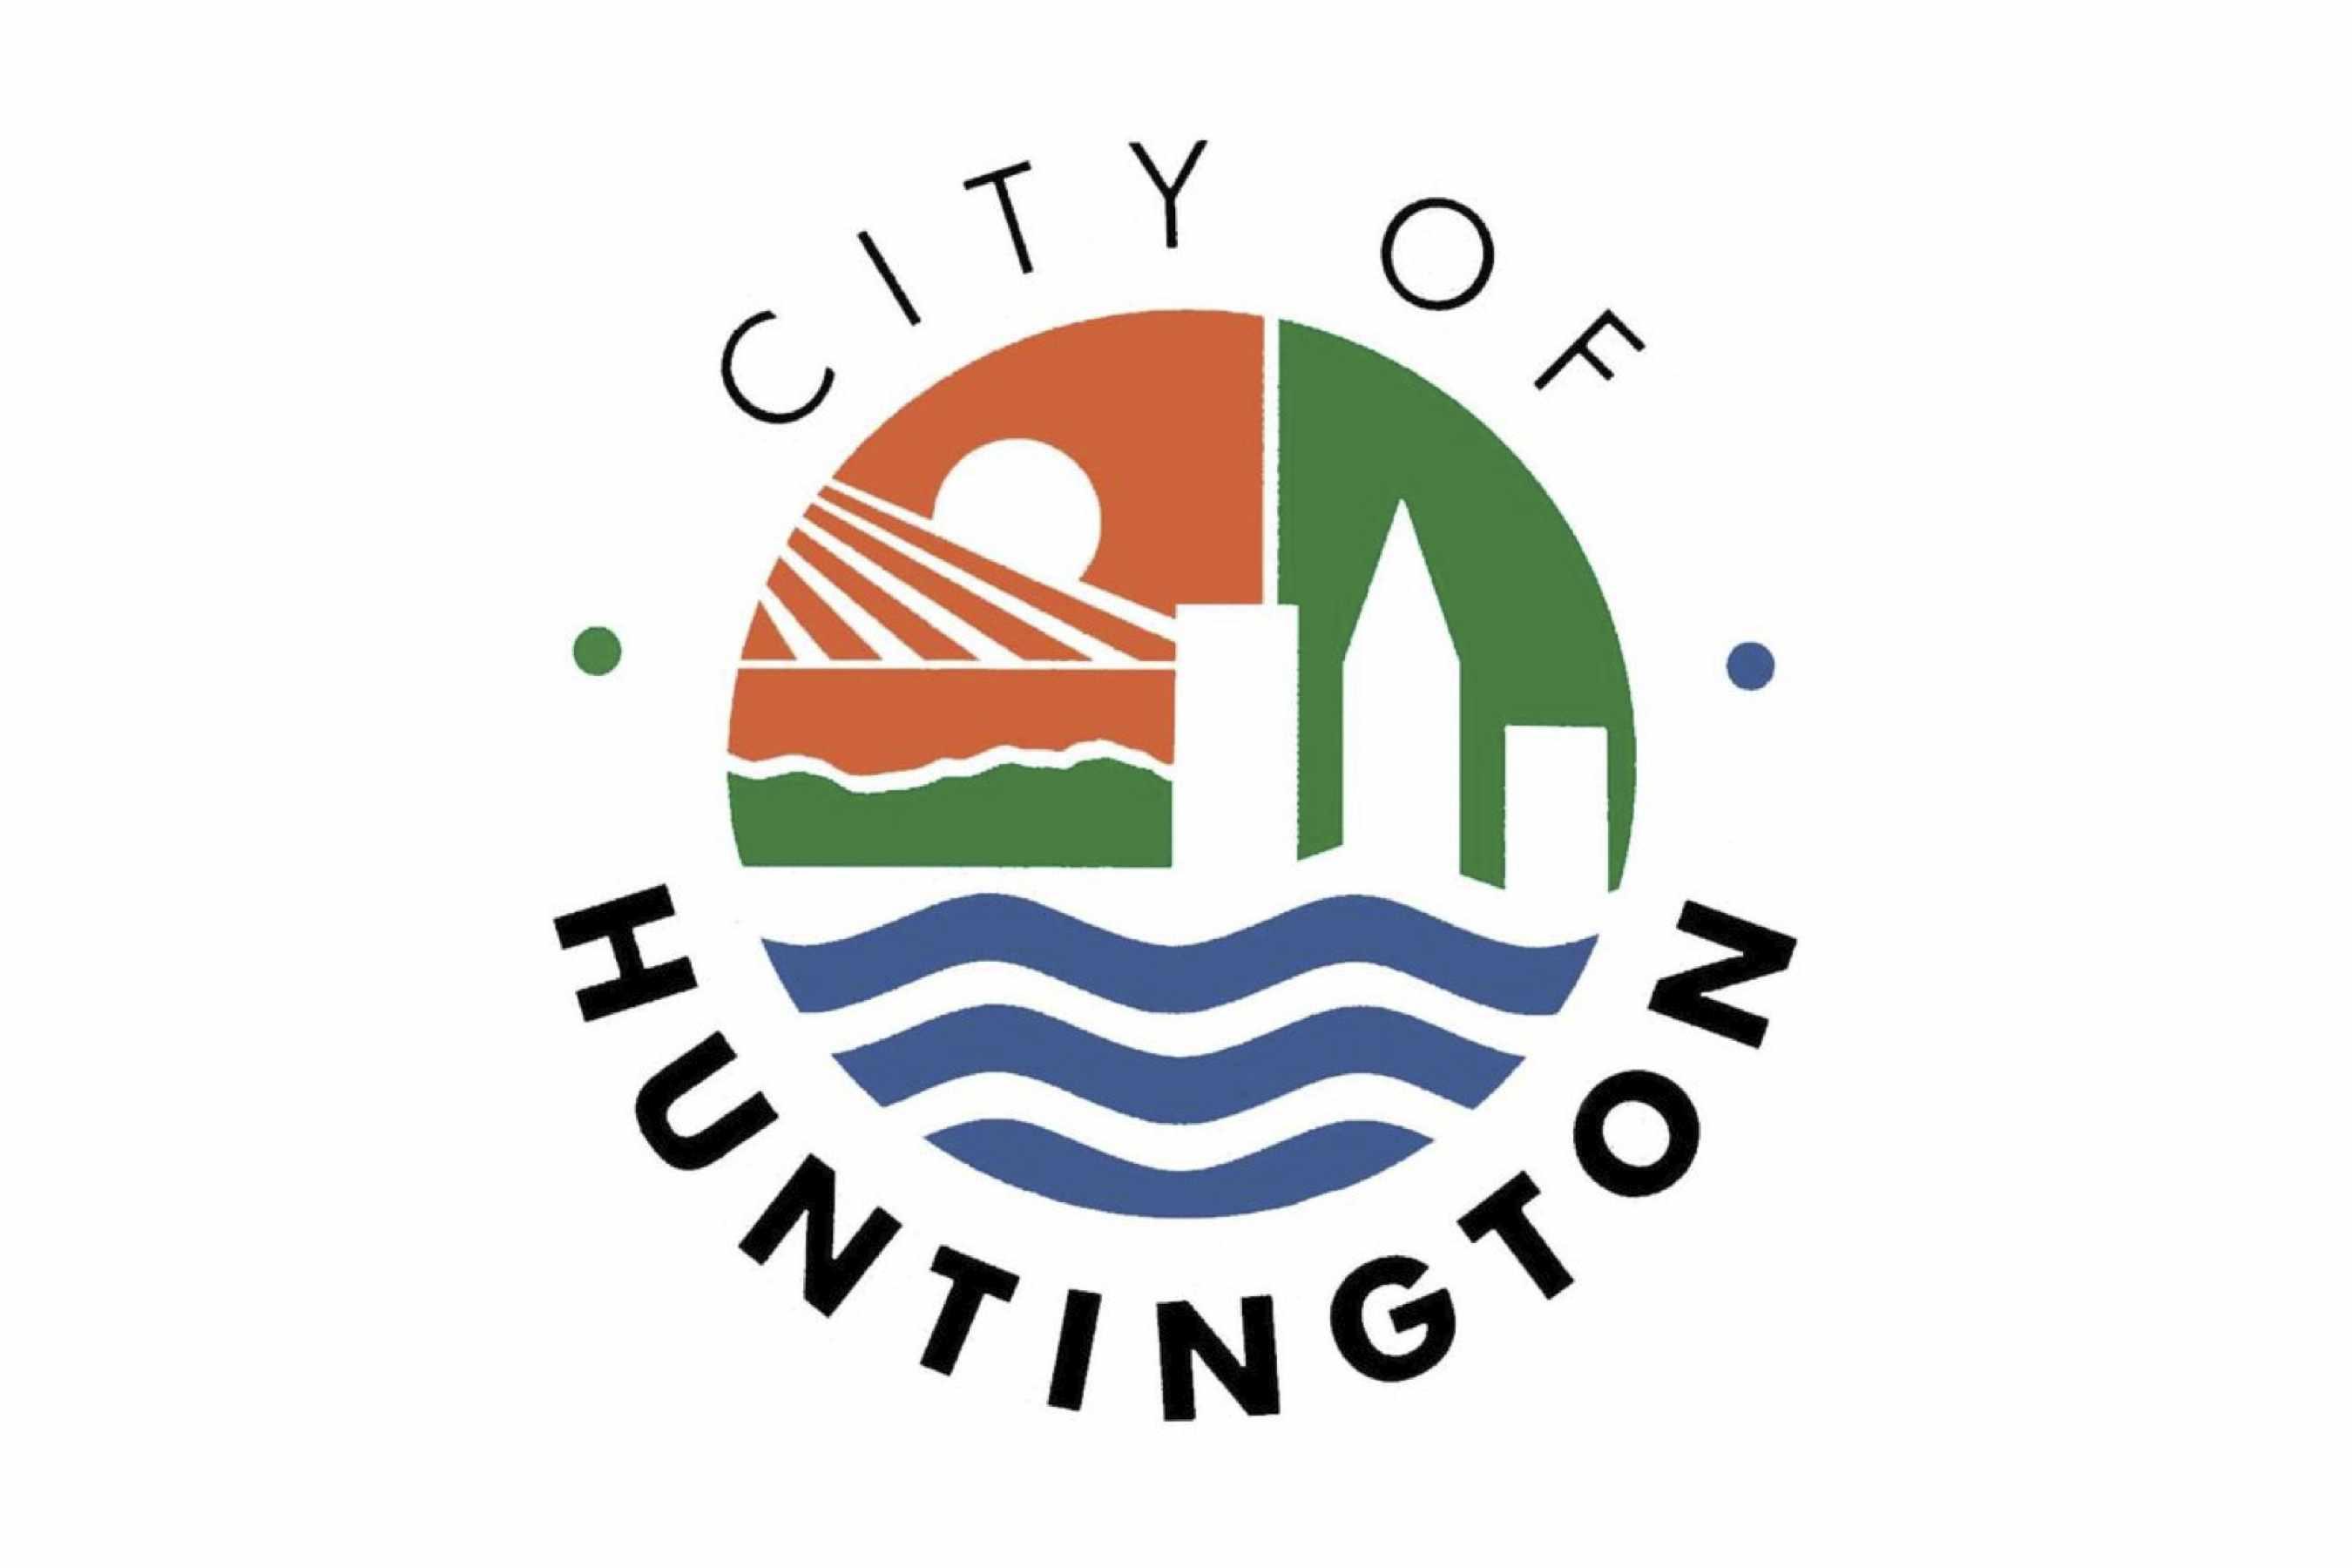 Huntington wv dating